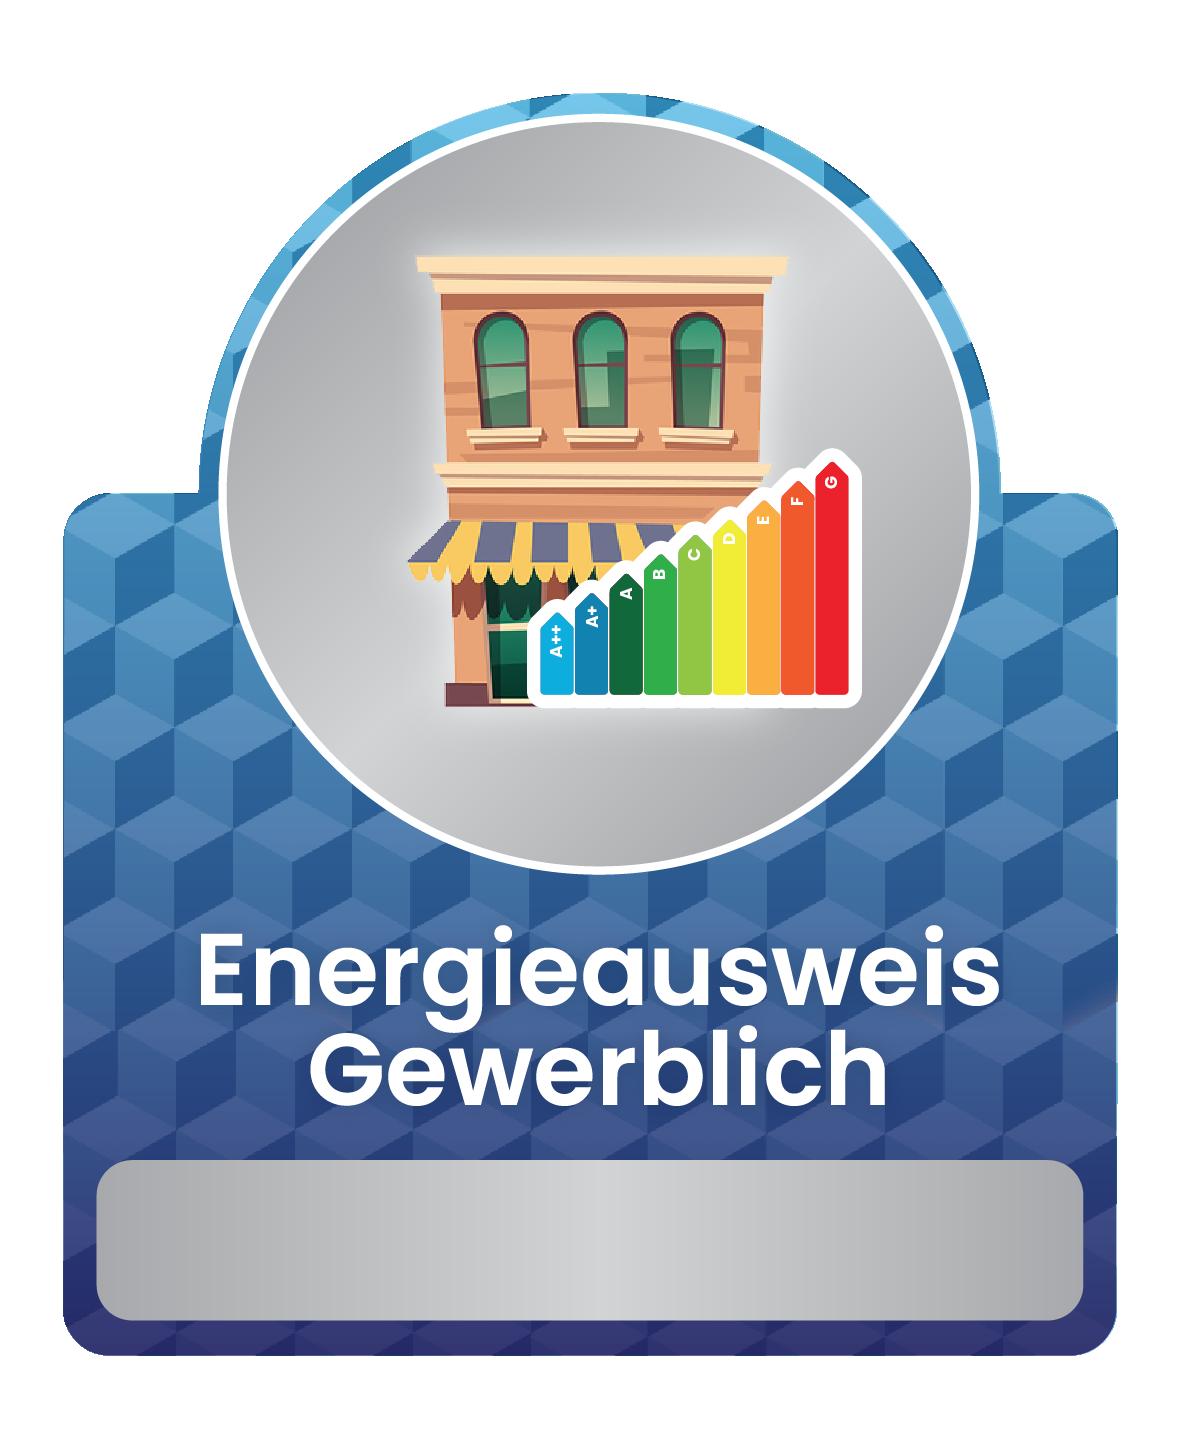 Energieausweis Gewerblich